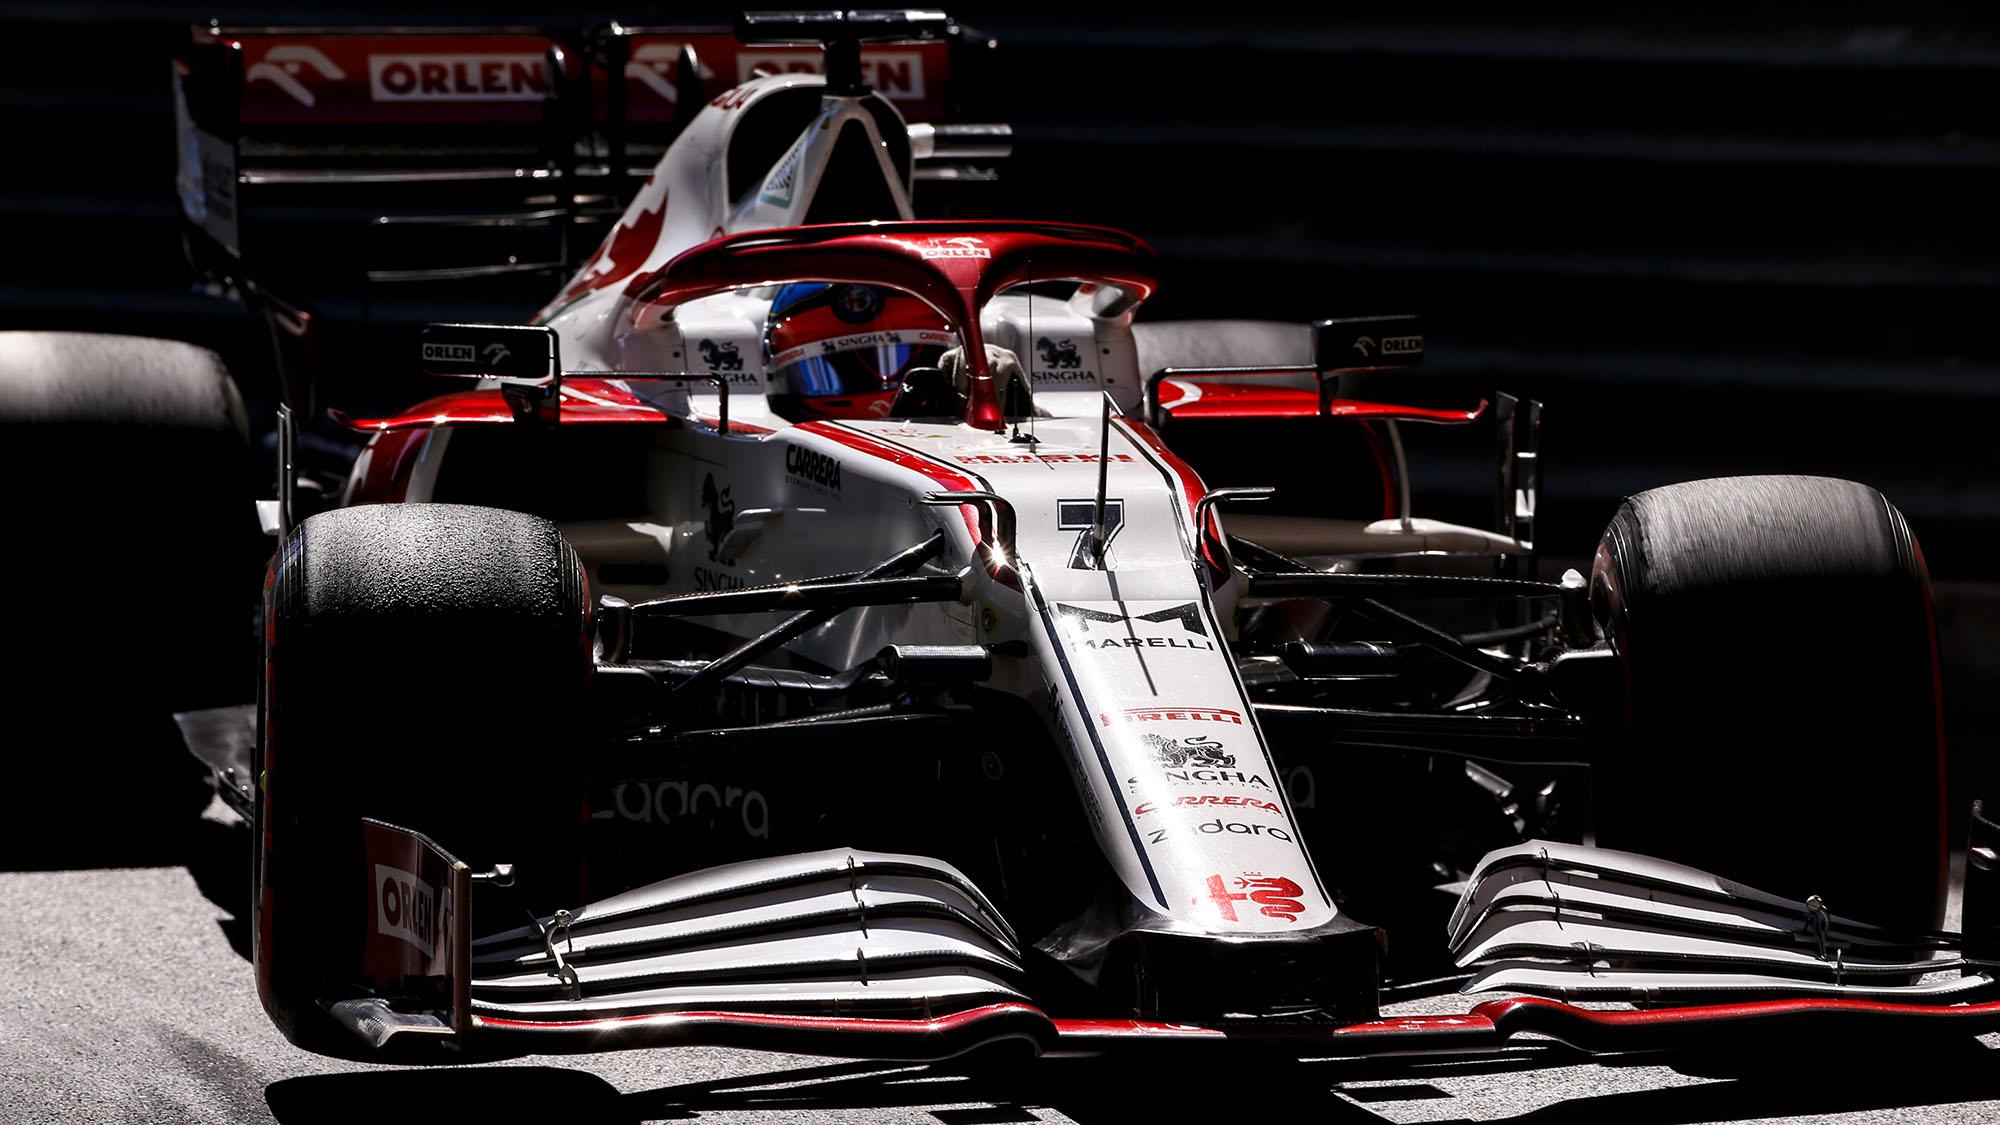 07 RAIKKONEN Kimi (fin), Alfa Romeo Racing ORLEN C41, action during the 2021 Formula One World Championship, Grand Prix of Monaco from on May 20 to 23 in Monaco - Photo DPPI